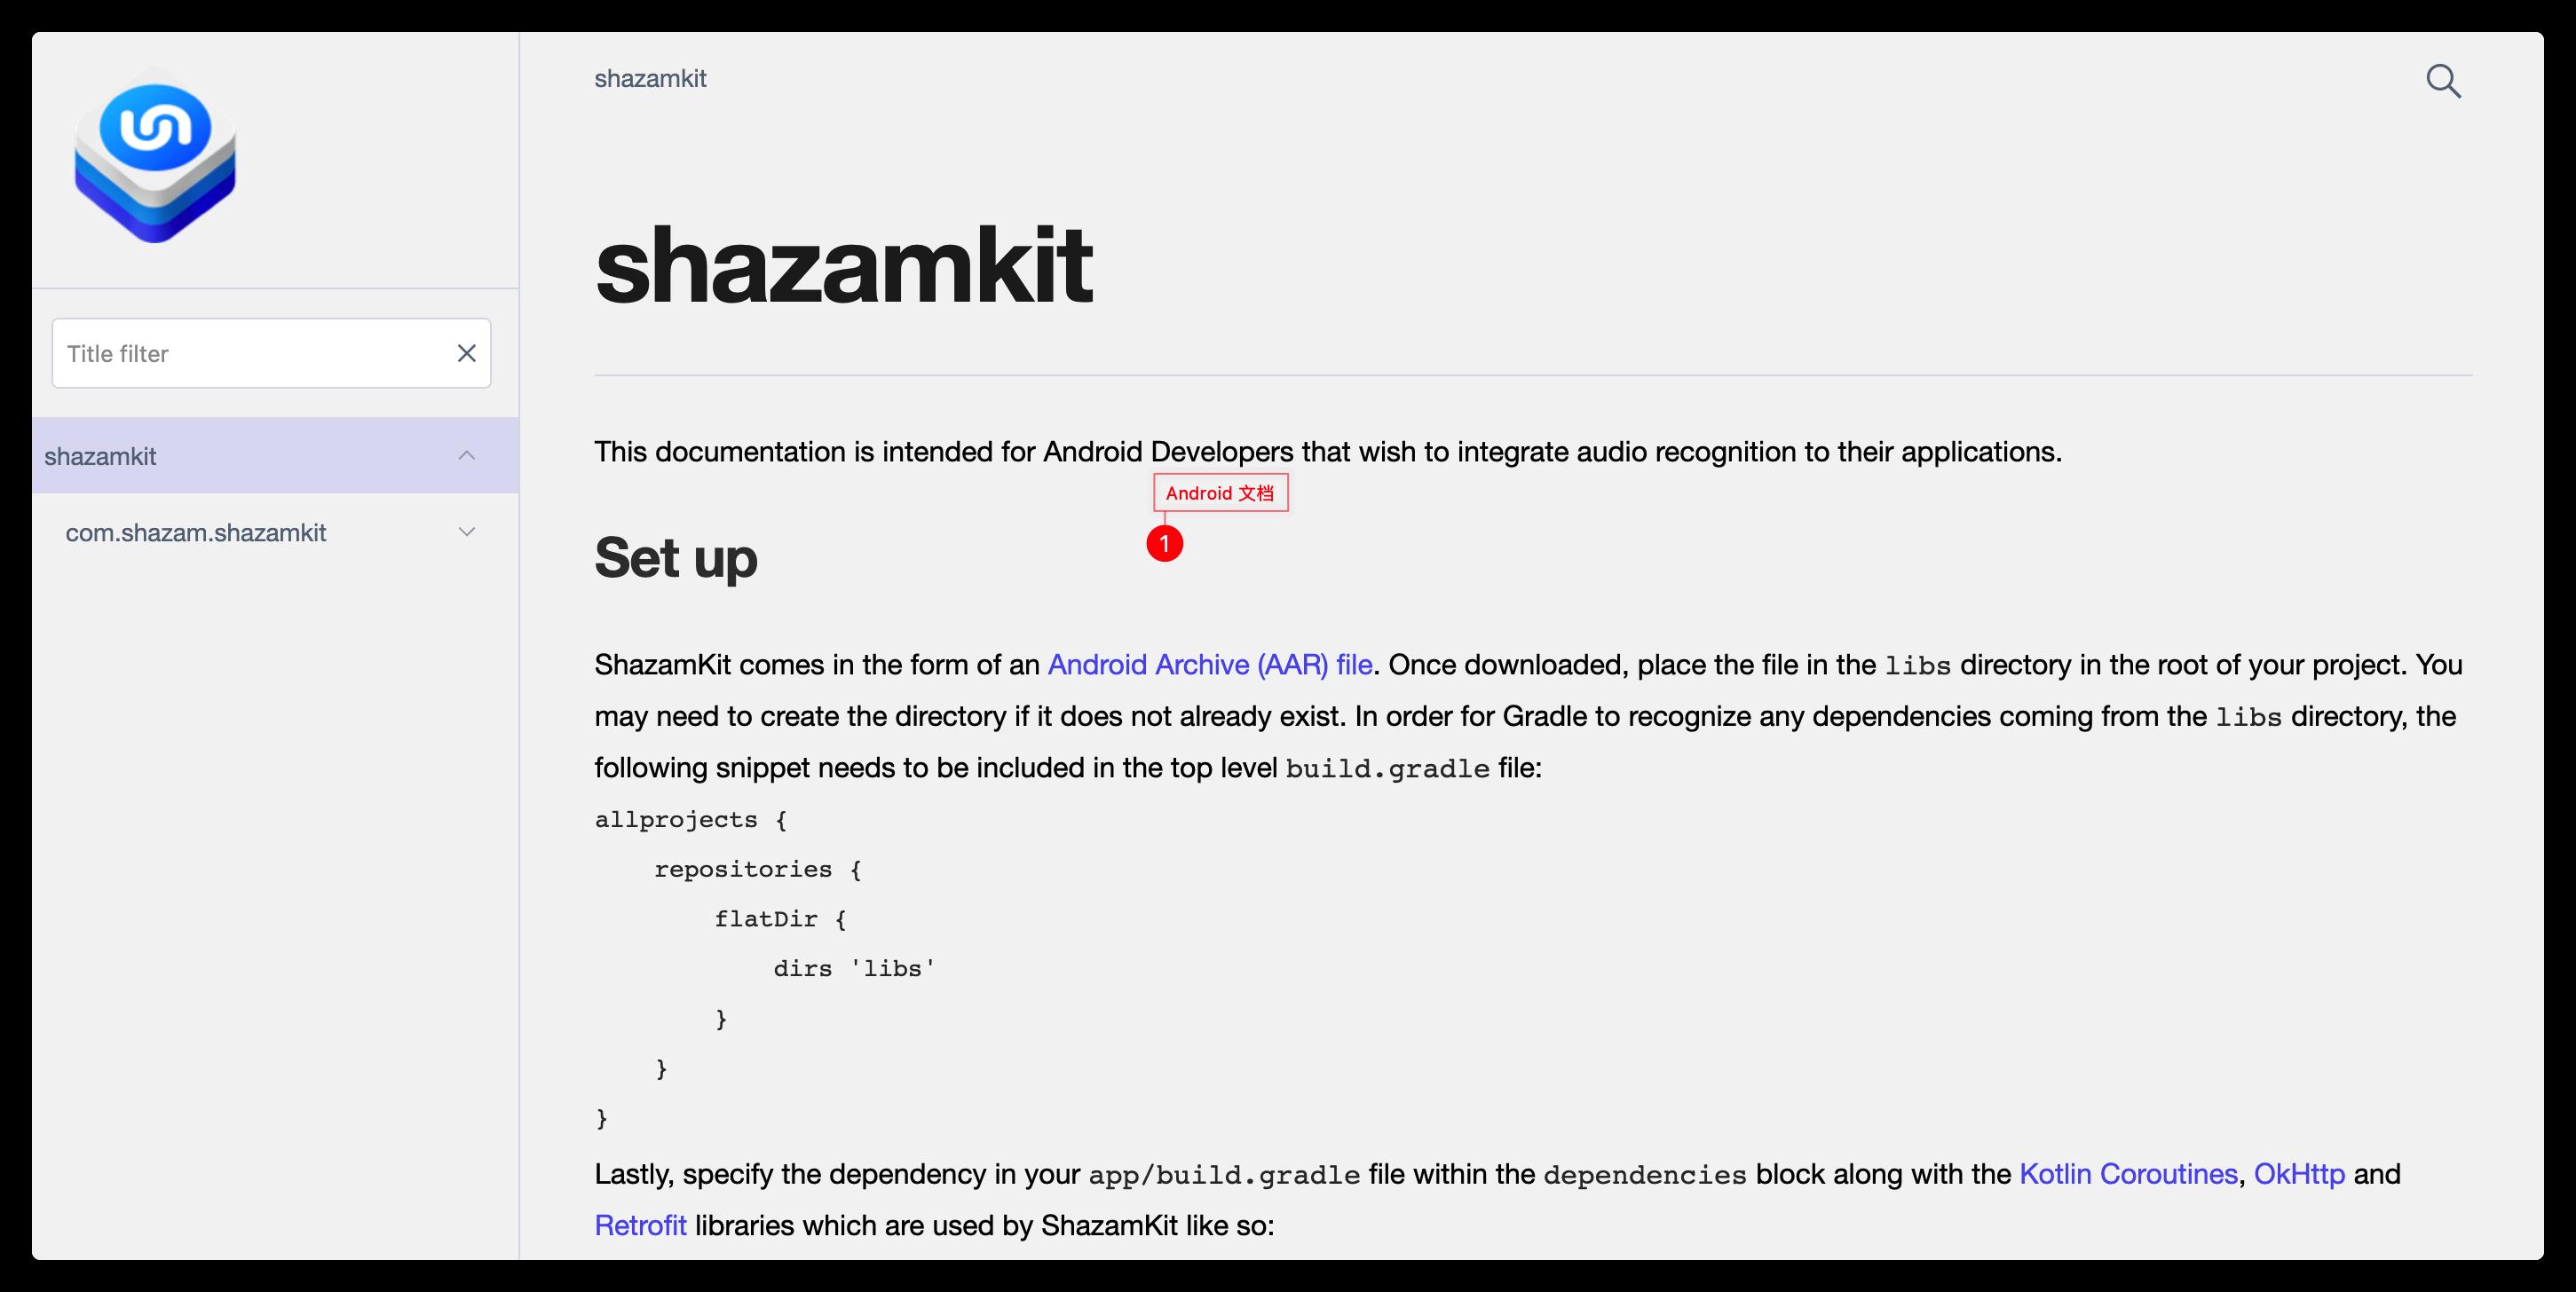 Apple更新: ShazamKit 音频识别,此SDK可以直接接入在Android系统中。